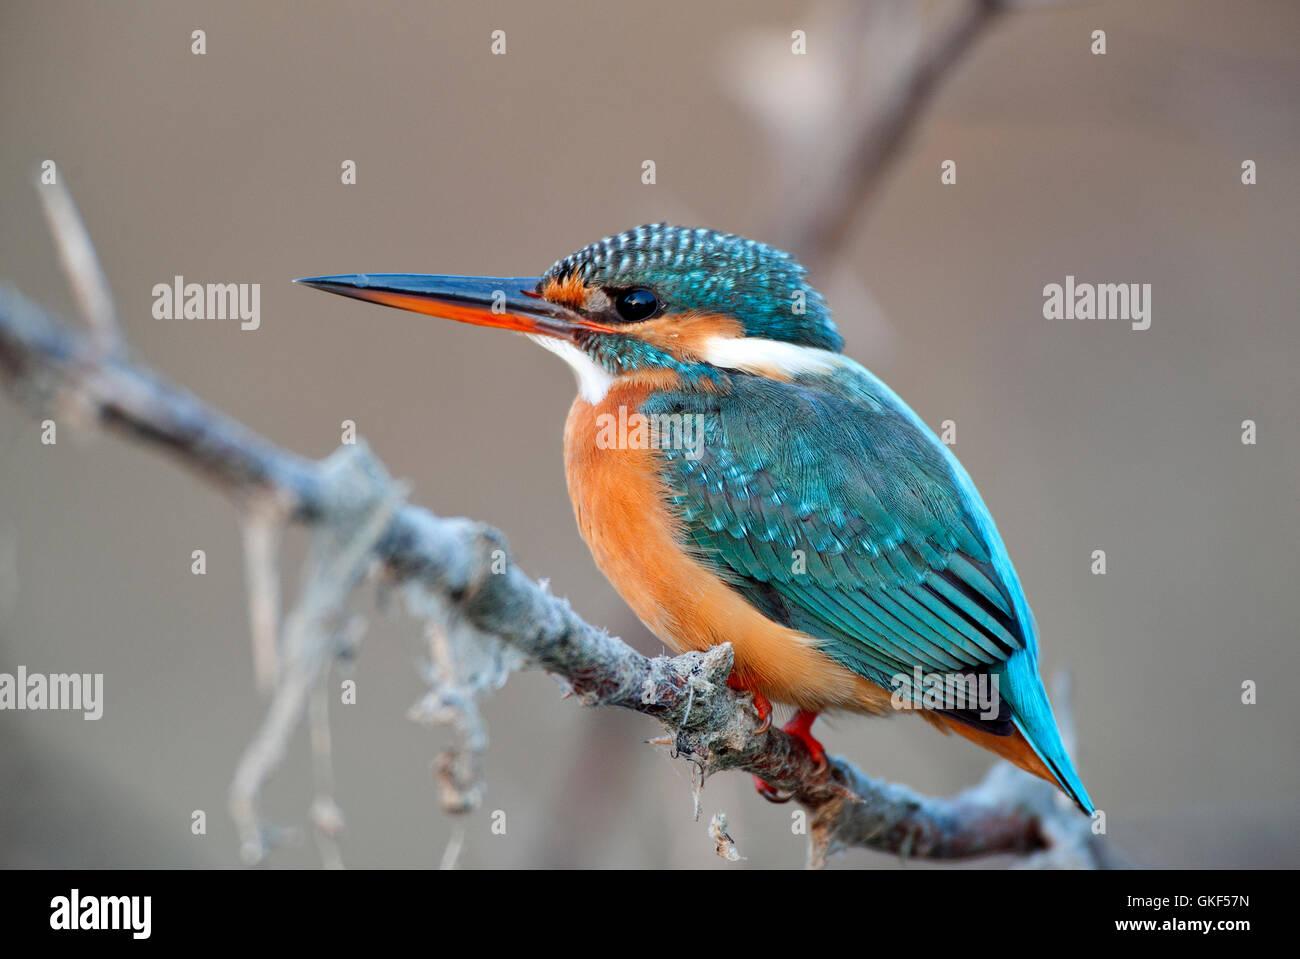 The image of Small Blue Kingfisher (  Alcedo atthis), Keoladev national park, Bharatpur, India - Stock Image